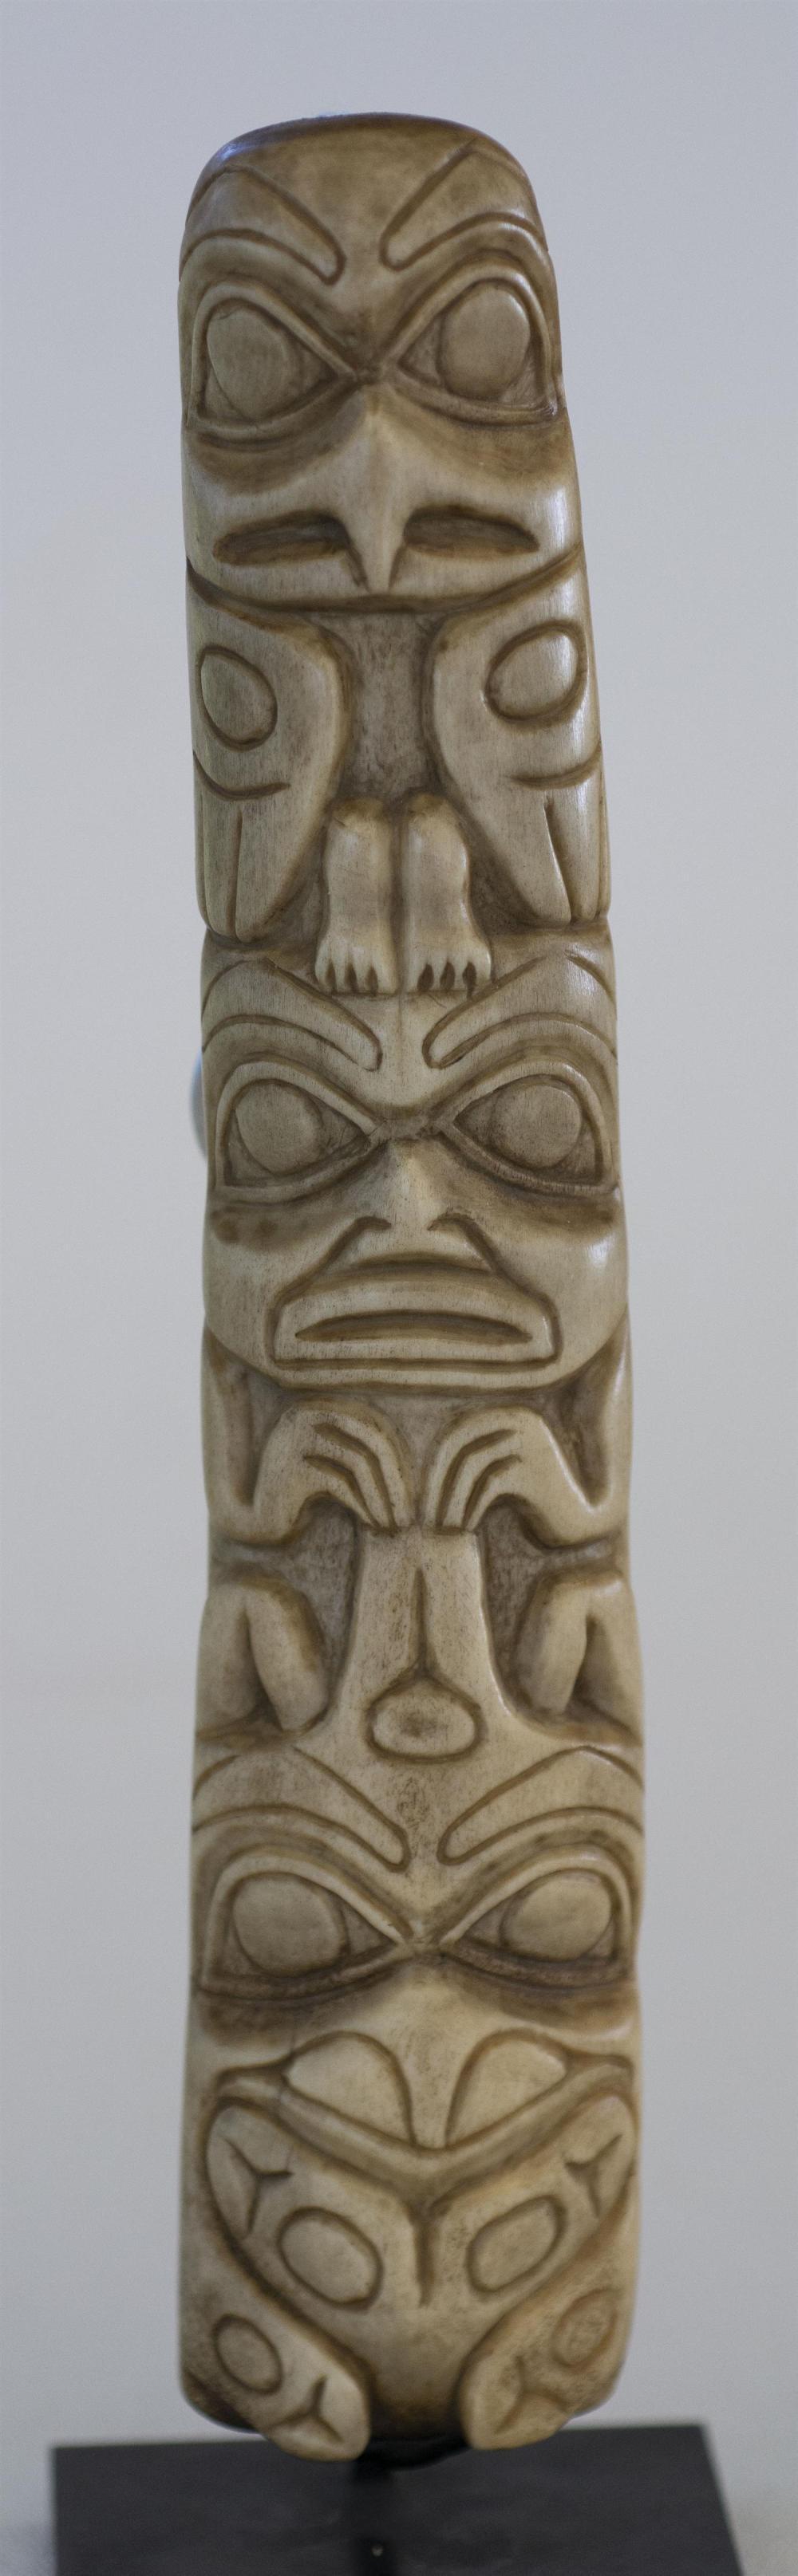 Northwest Coastal Carved Bone Totem Height 7 5 Width 1 5